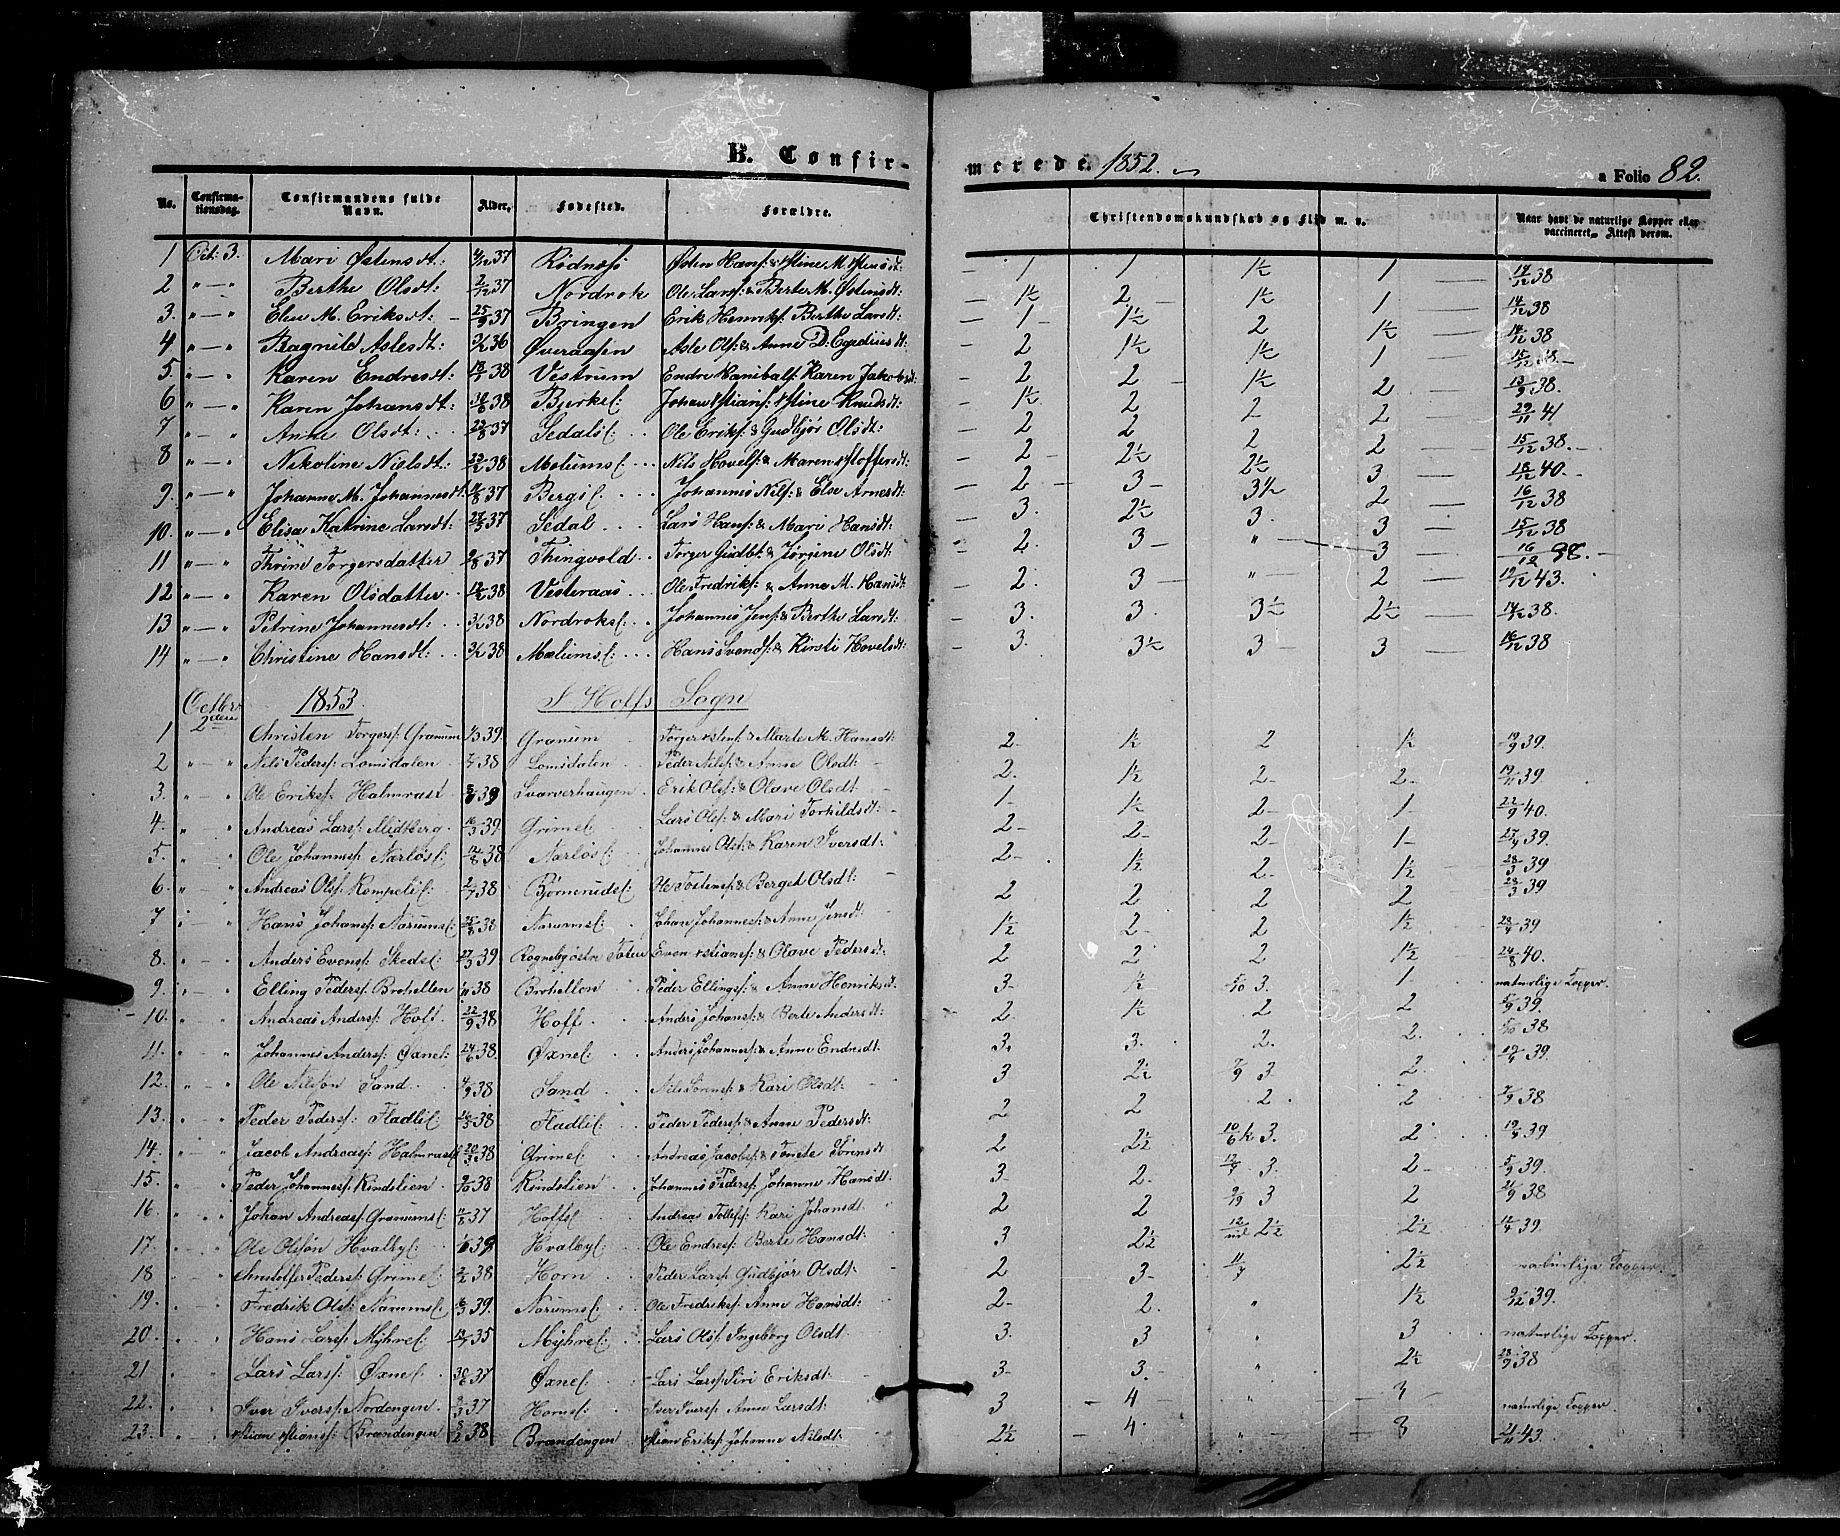 SAH, Land prestekontor, Ministerialbok nr. 9, 1847-1859, s. 82